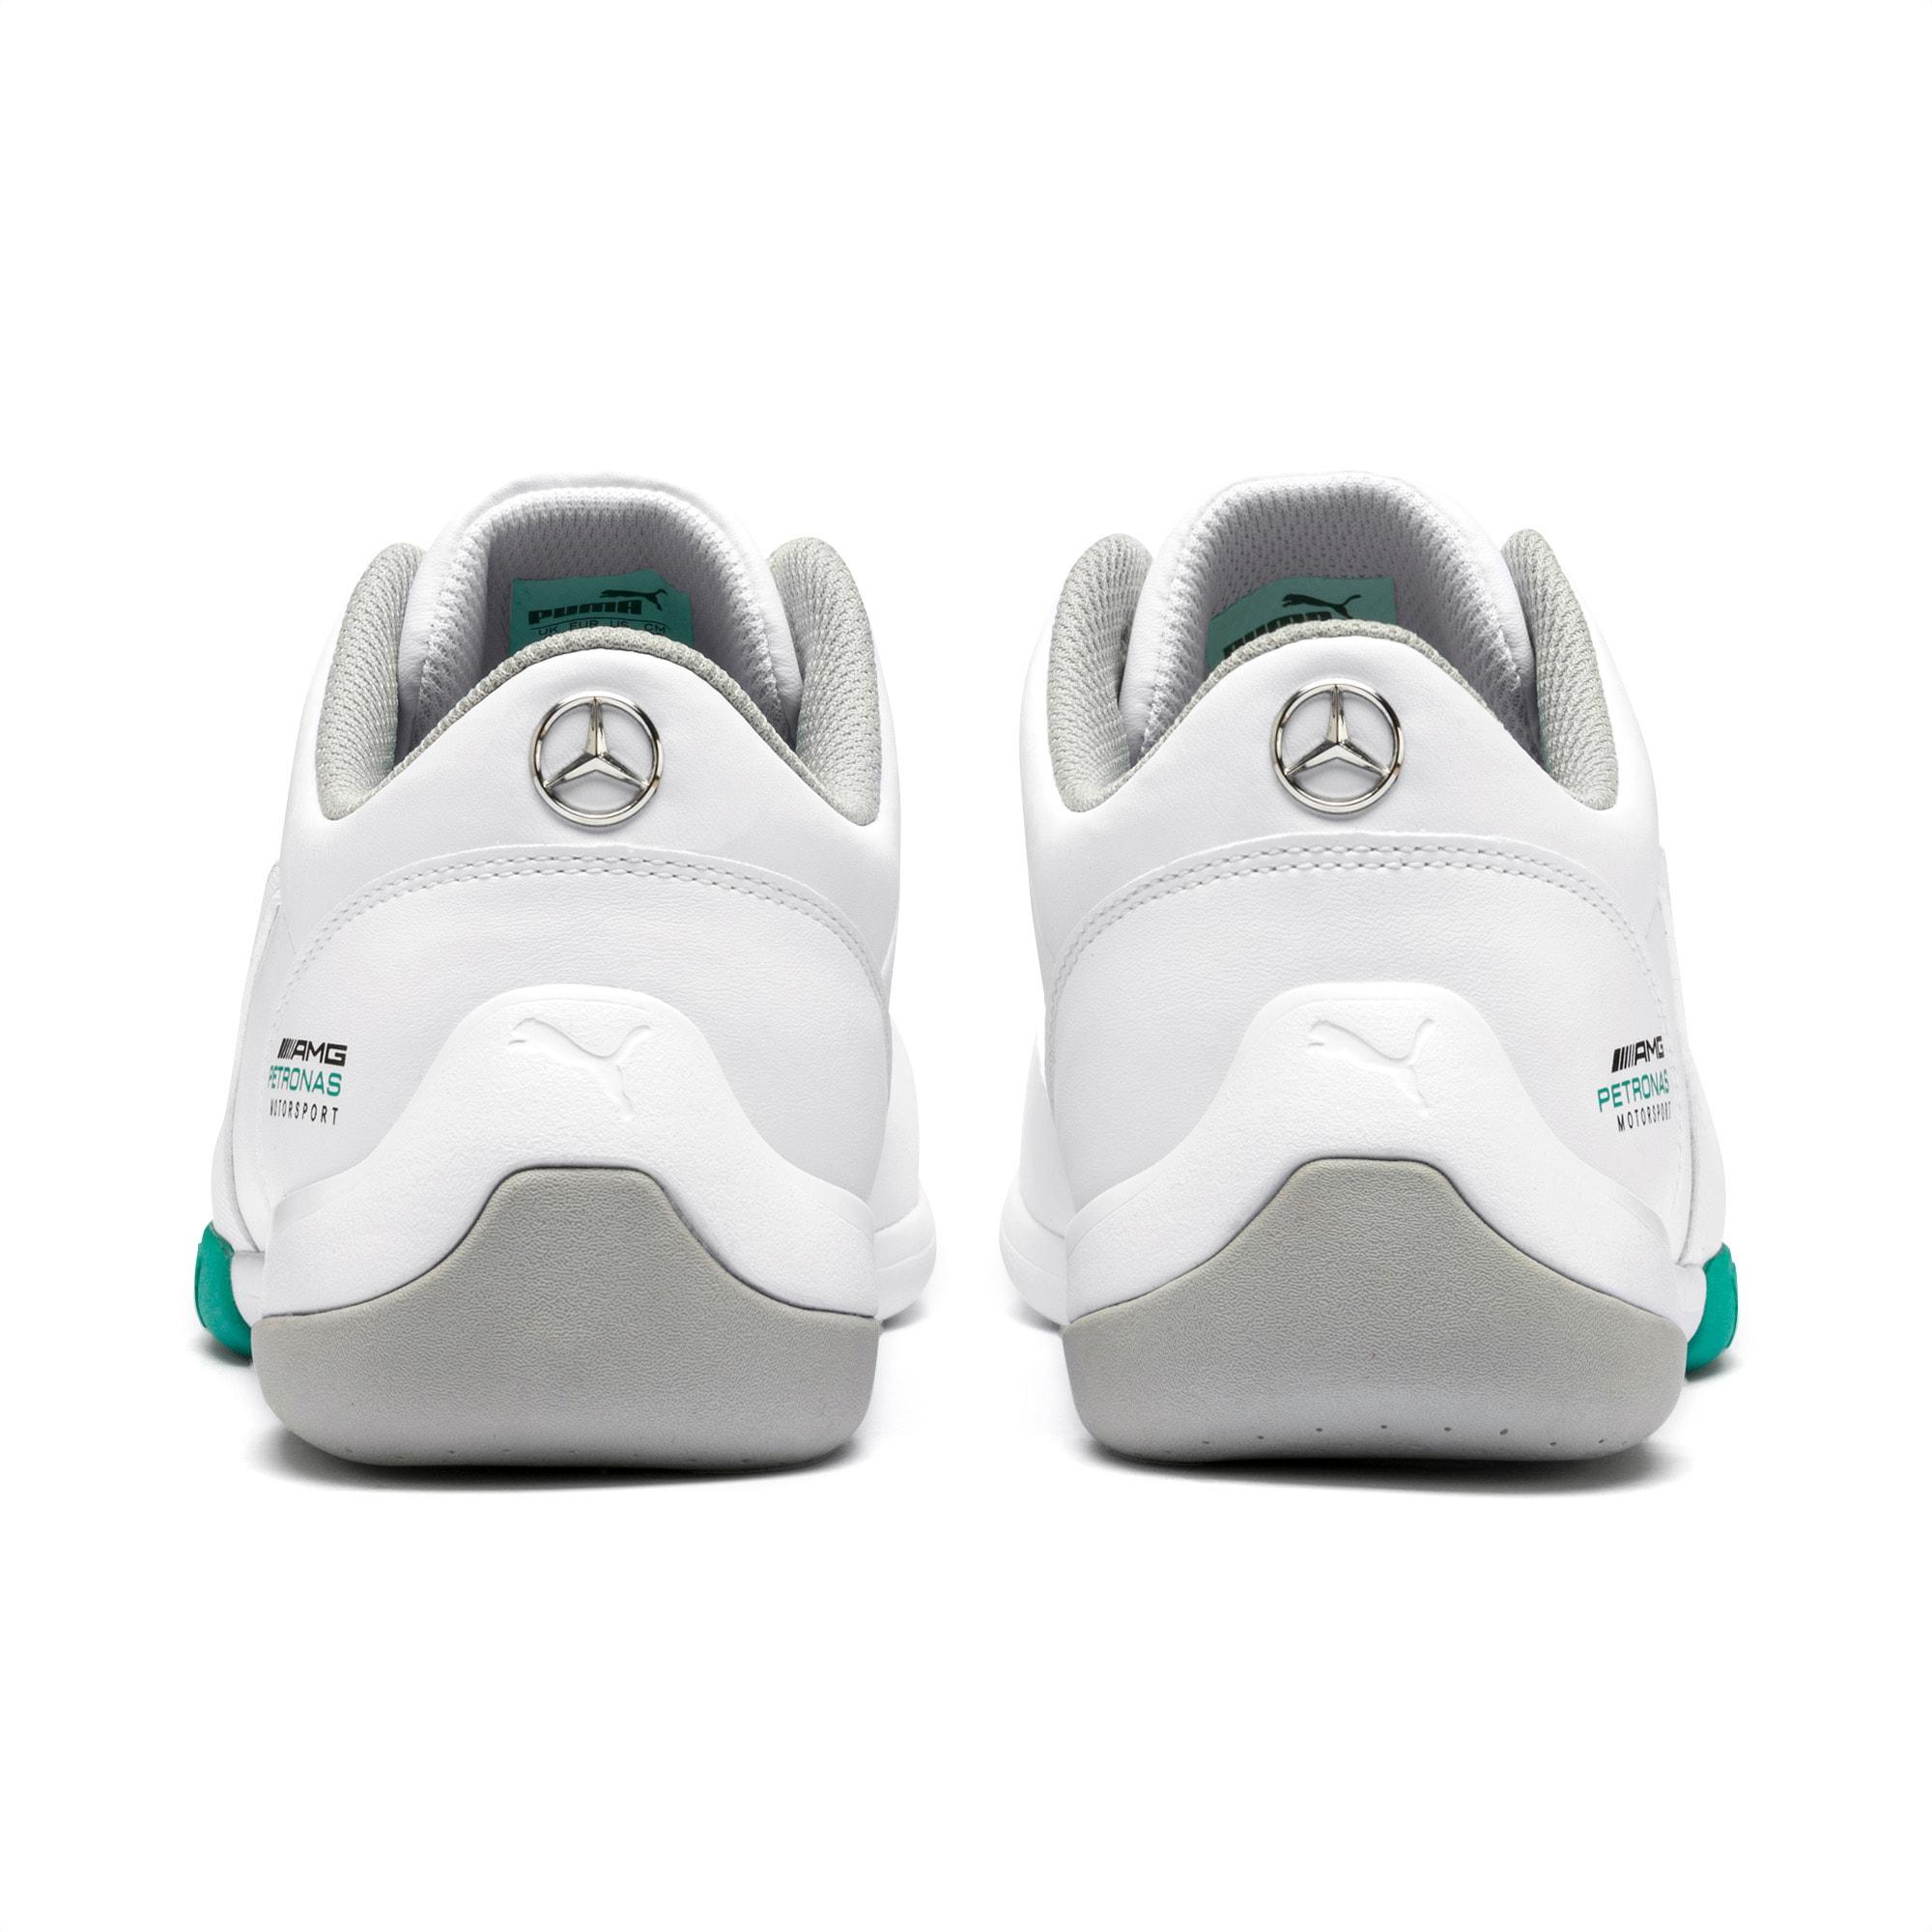 chaussure puma amg mercedes